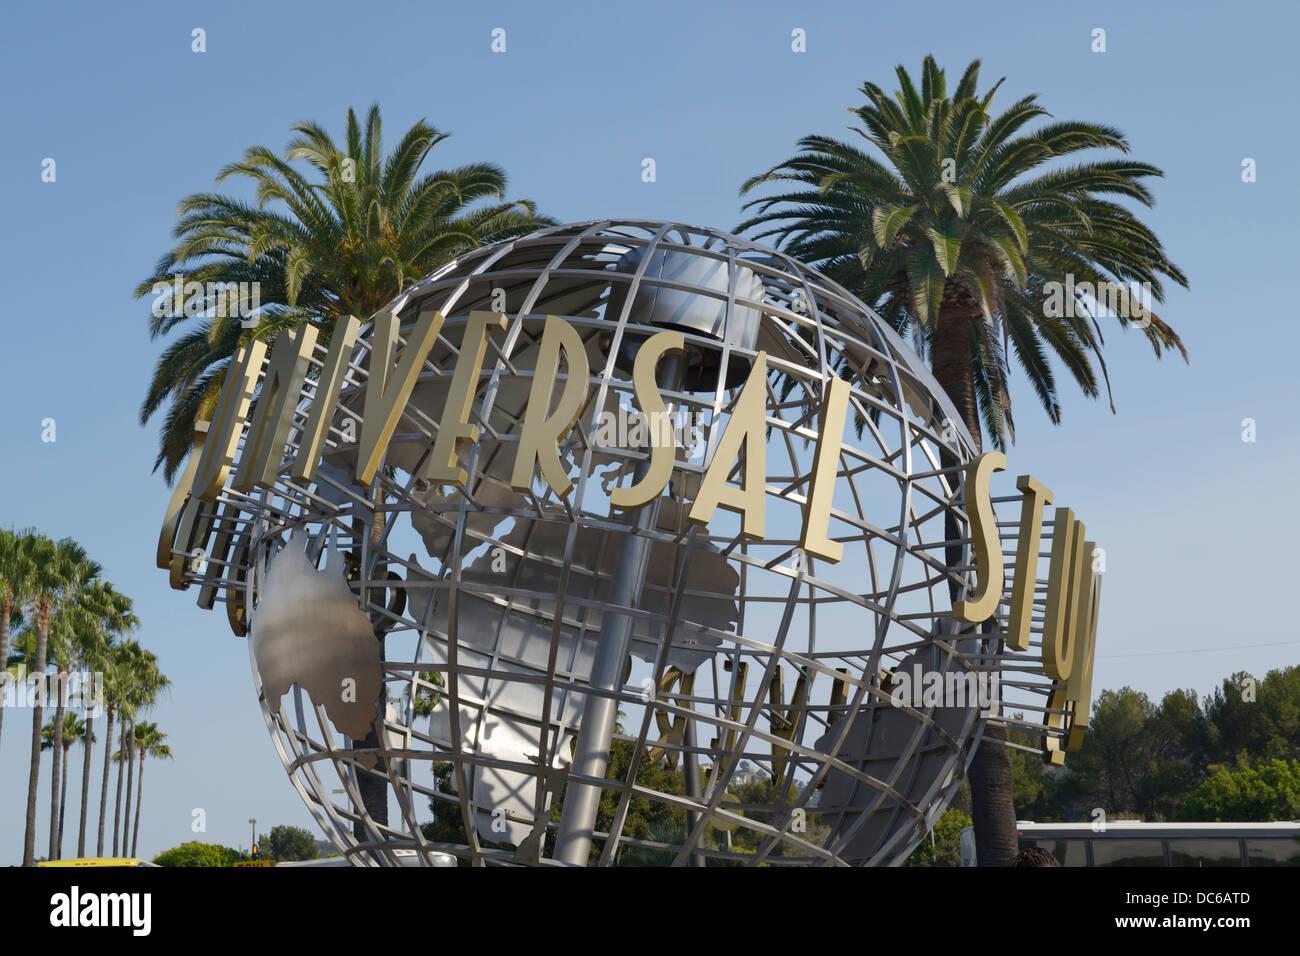 Universal Studios, Hollywood, CA - Stock Image